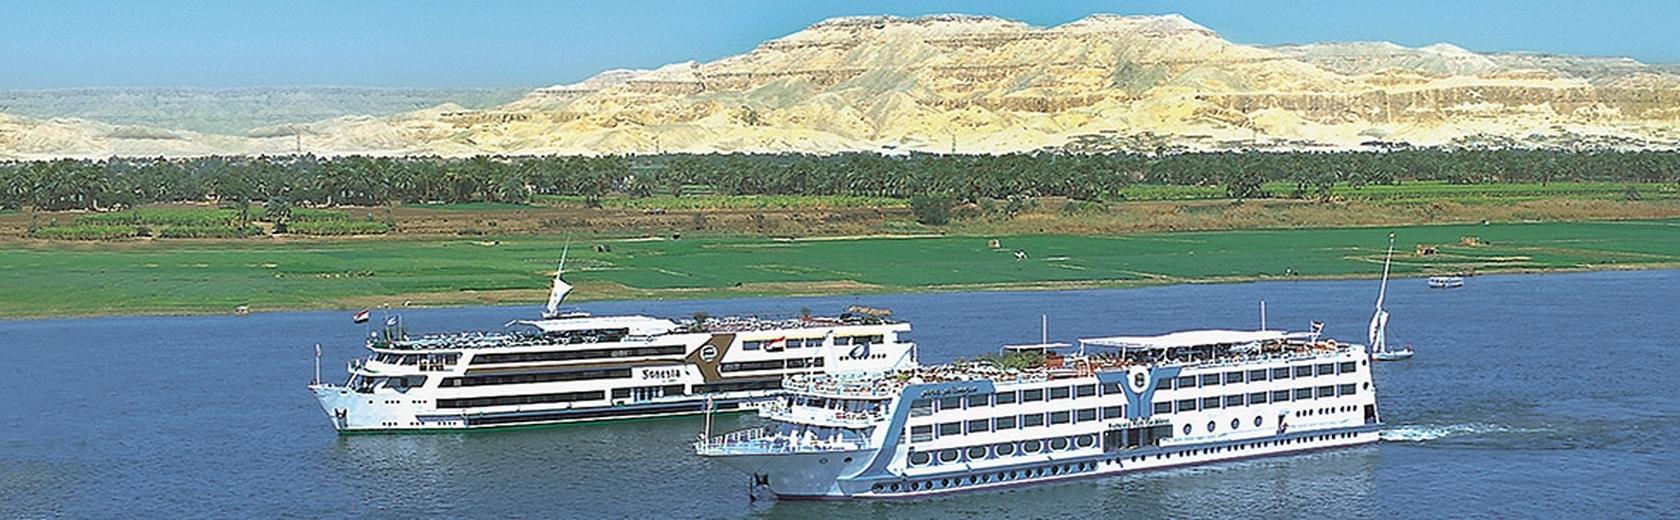 Nilfahrt bei Cleopatra Travel